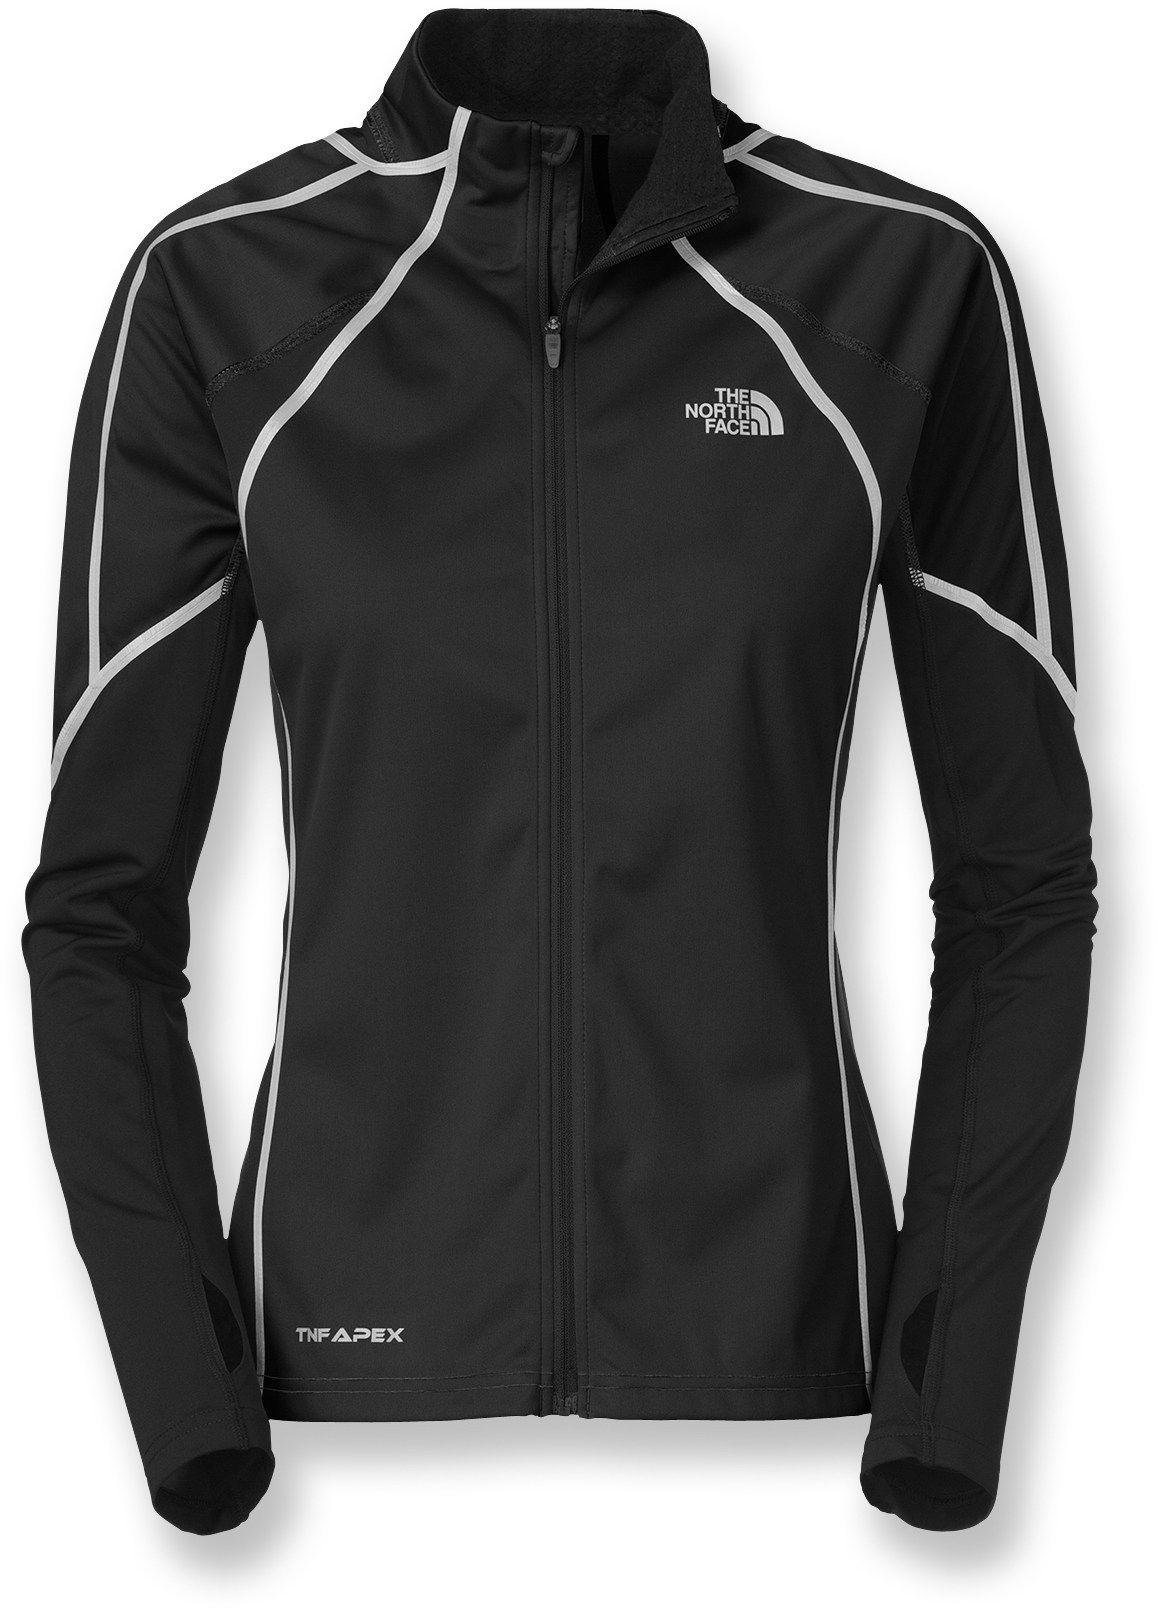 237b906045d3 The North Face Apex ClimateBlock Jacket - Women s - Running gear ...